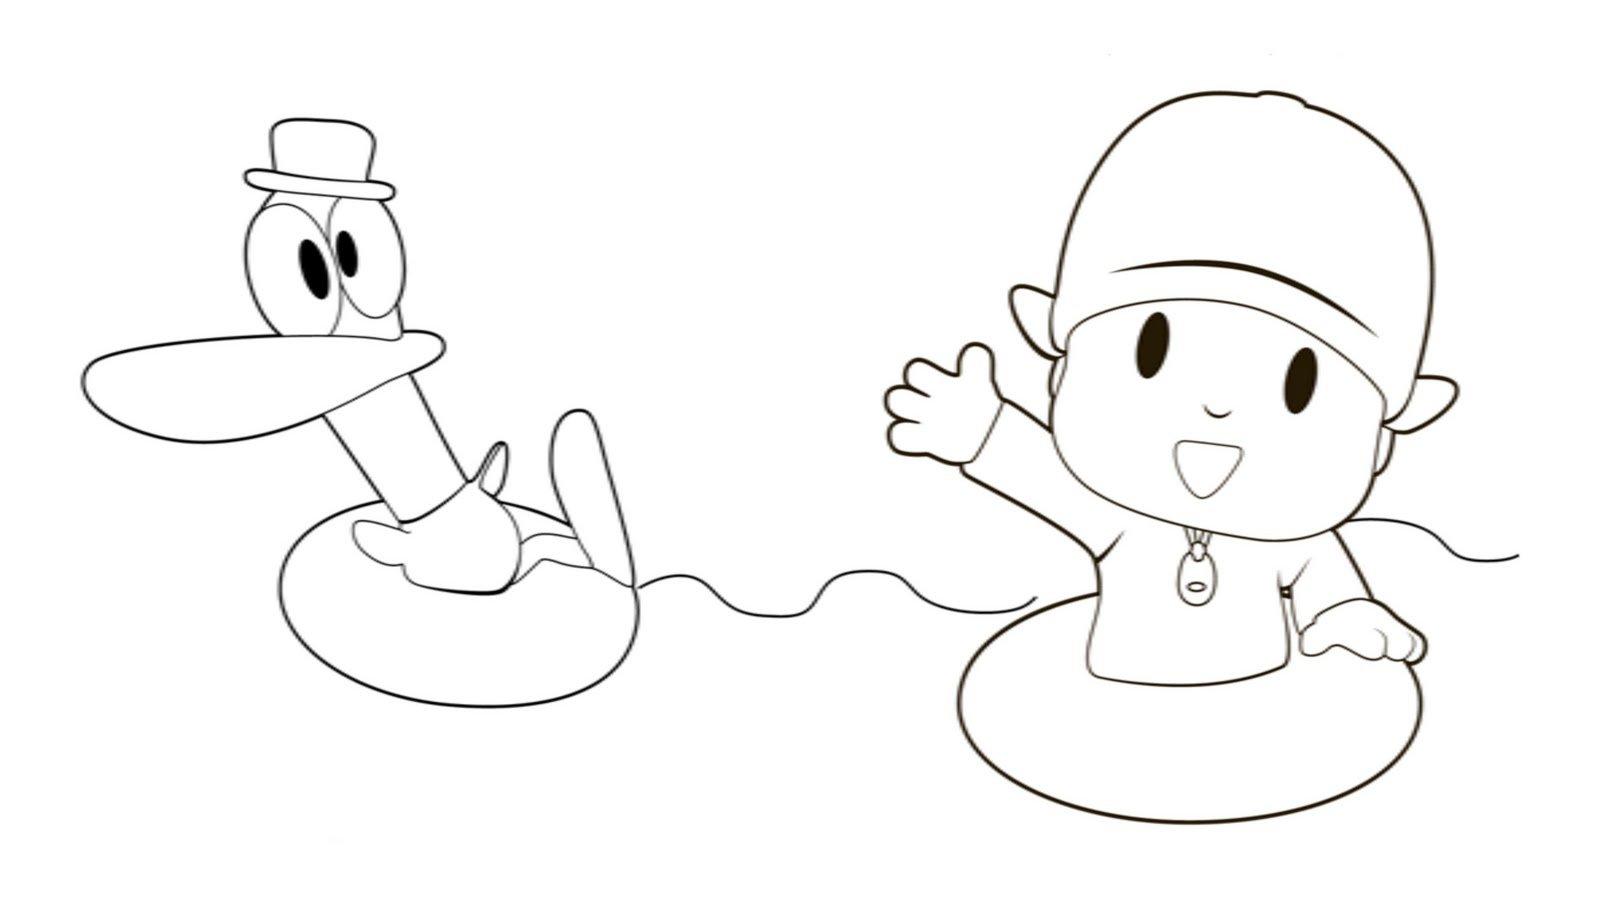 Desenho De Pocoyo E Pato Para Colorir